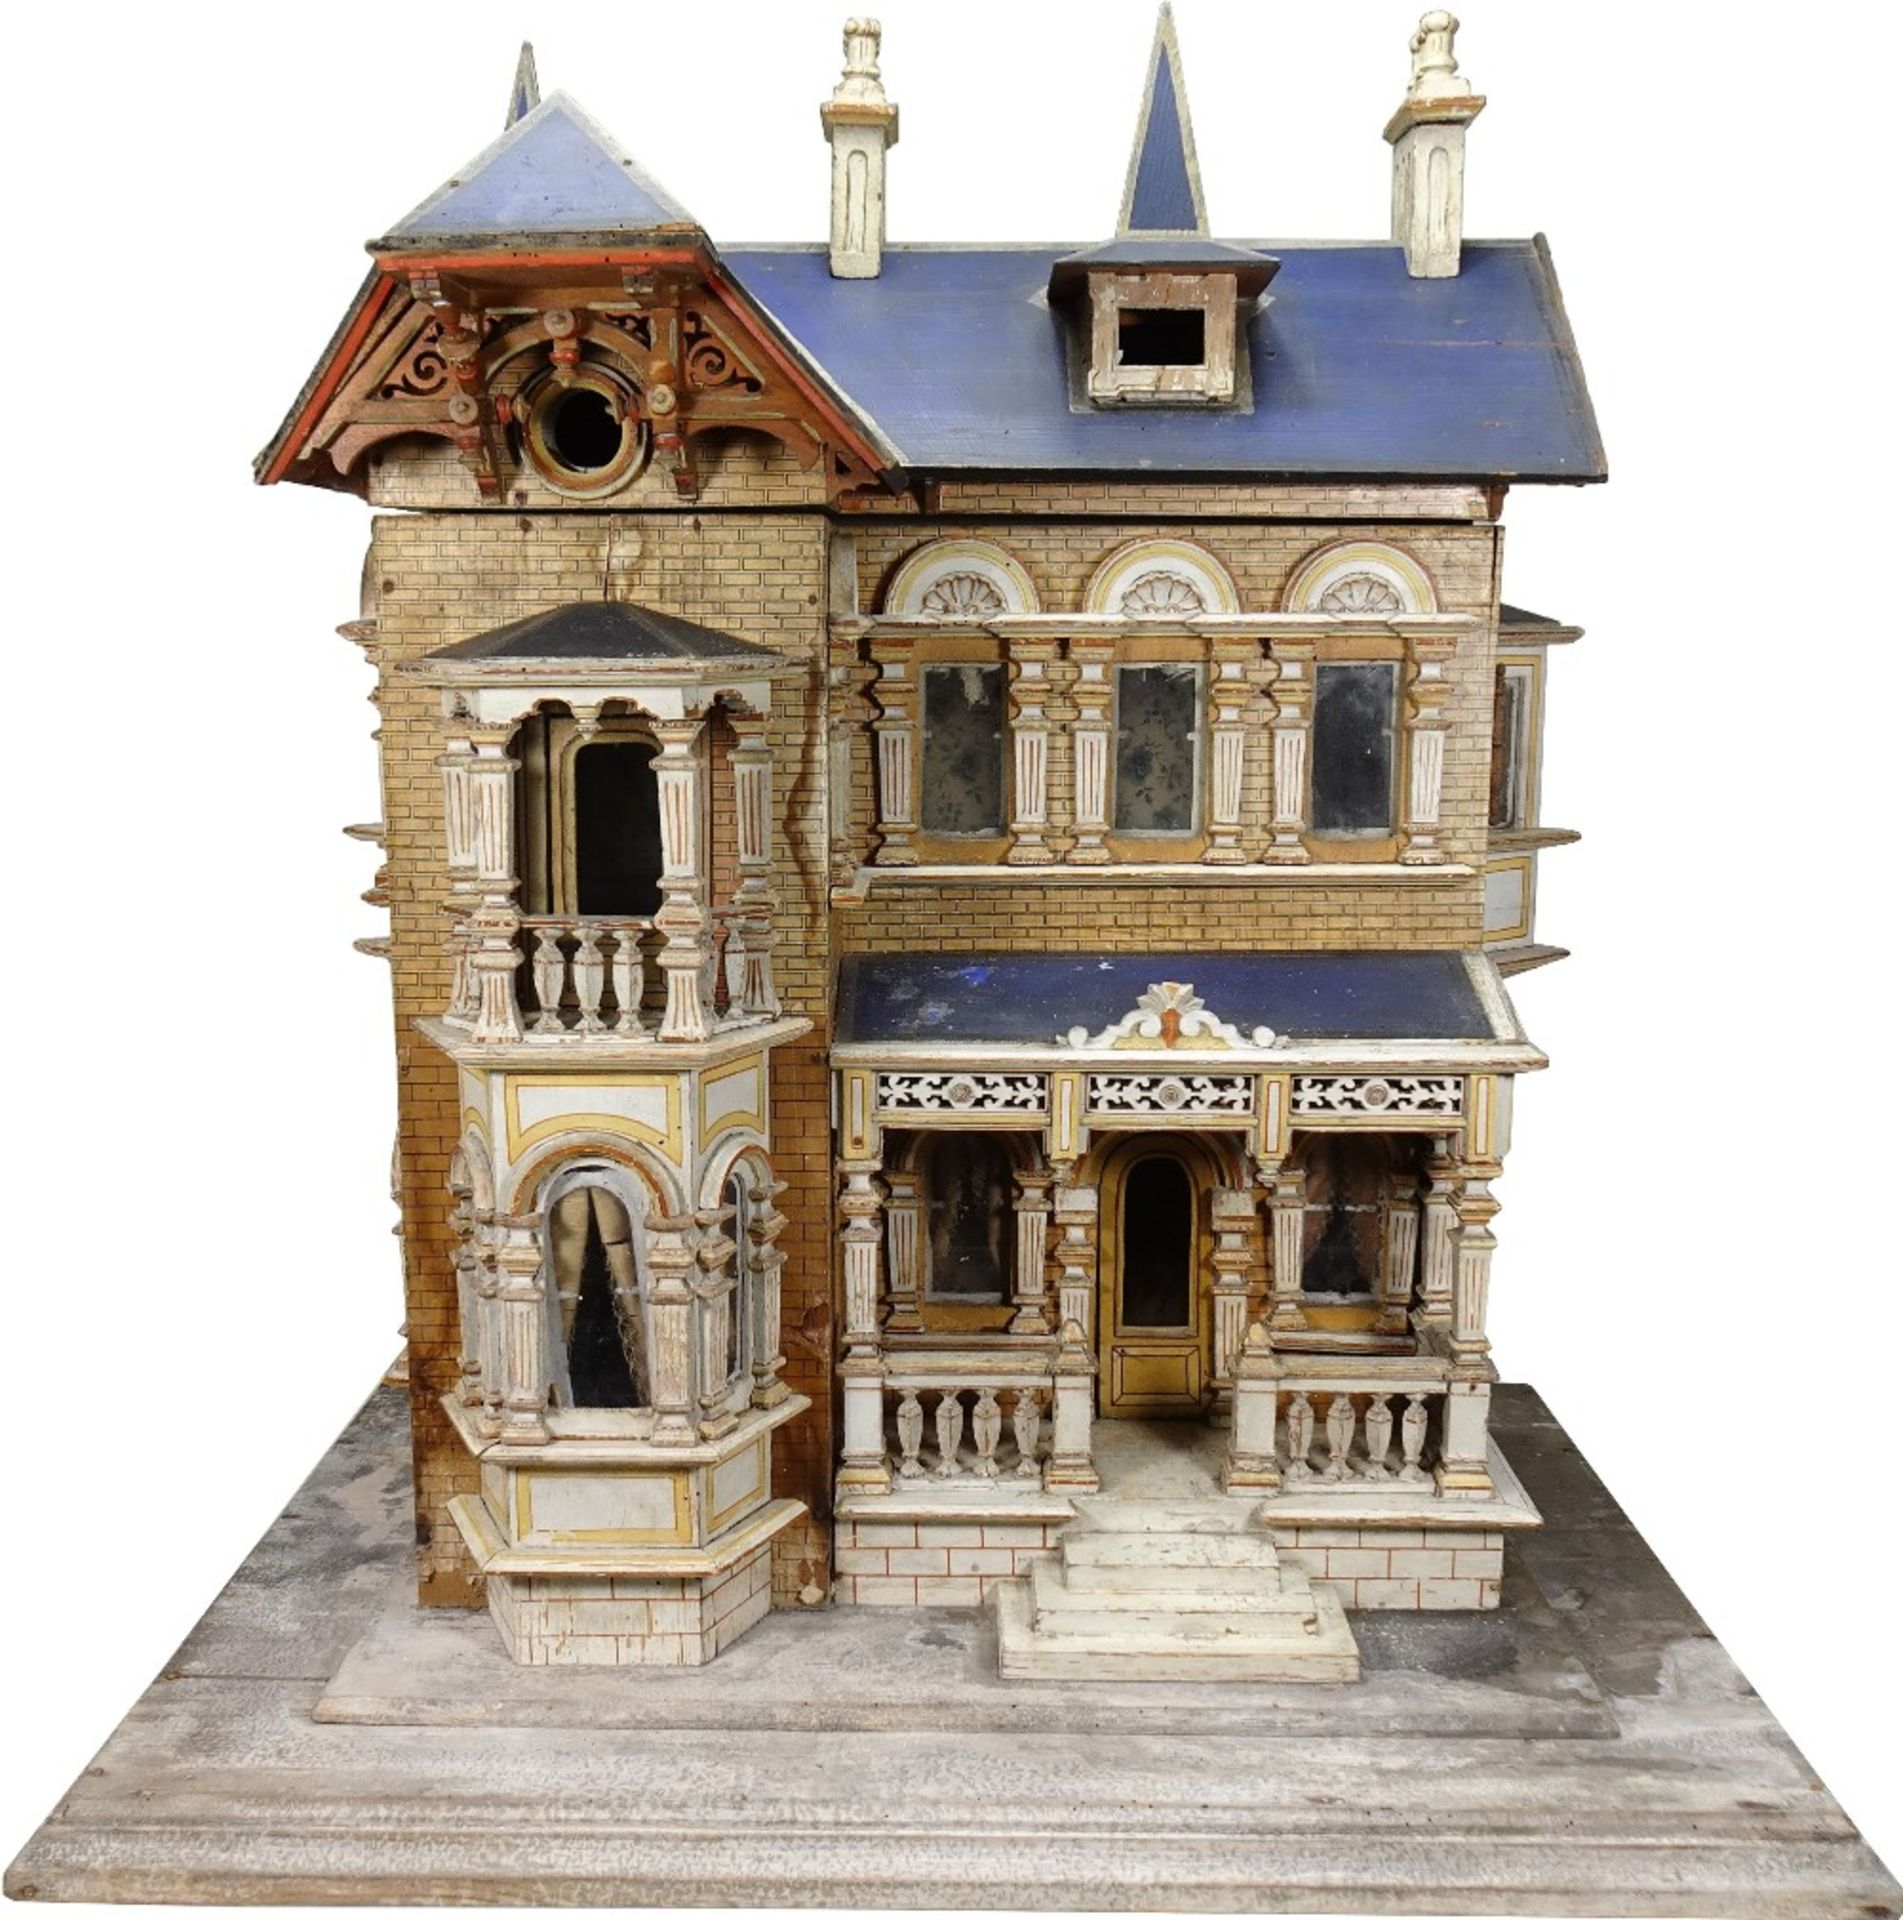 A large and impressive Moritz Gottschalk blue roof dolls house model: 2556/2 in original condition,